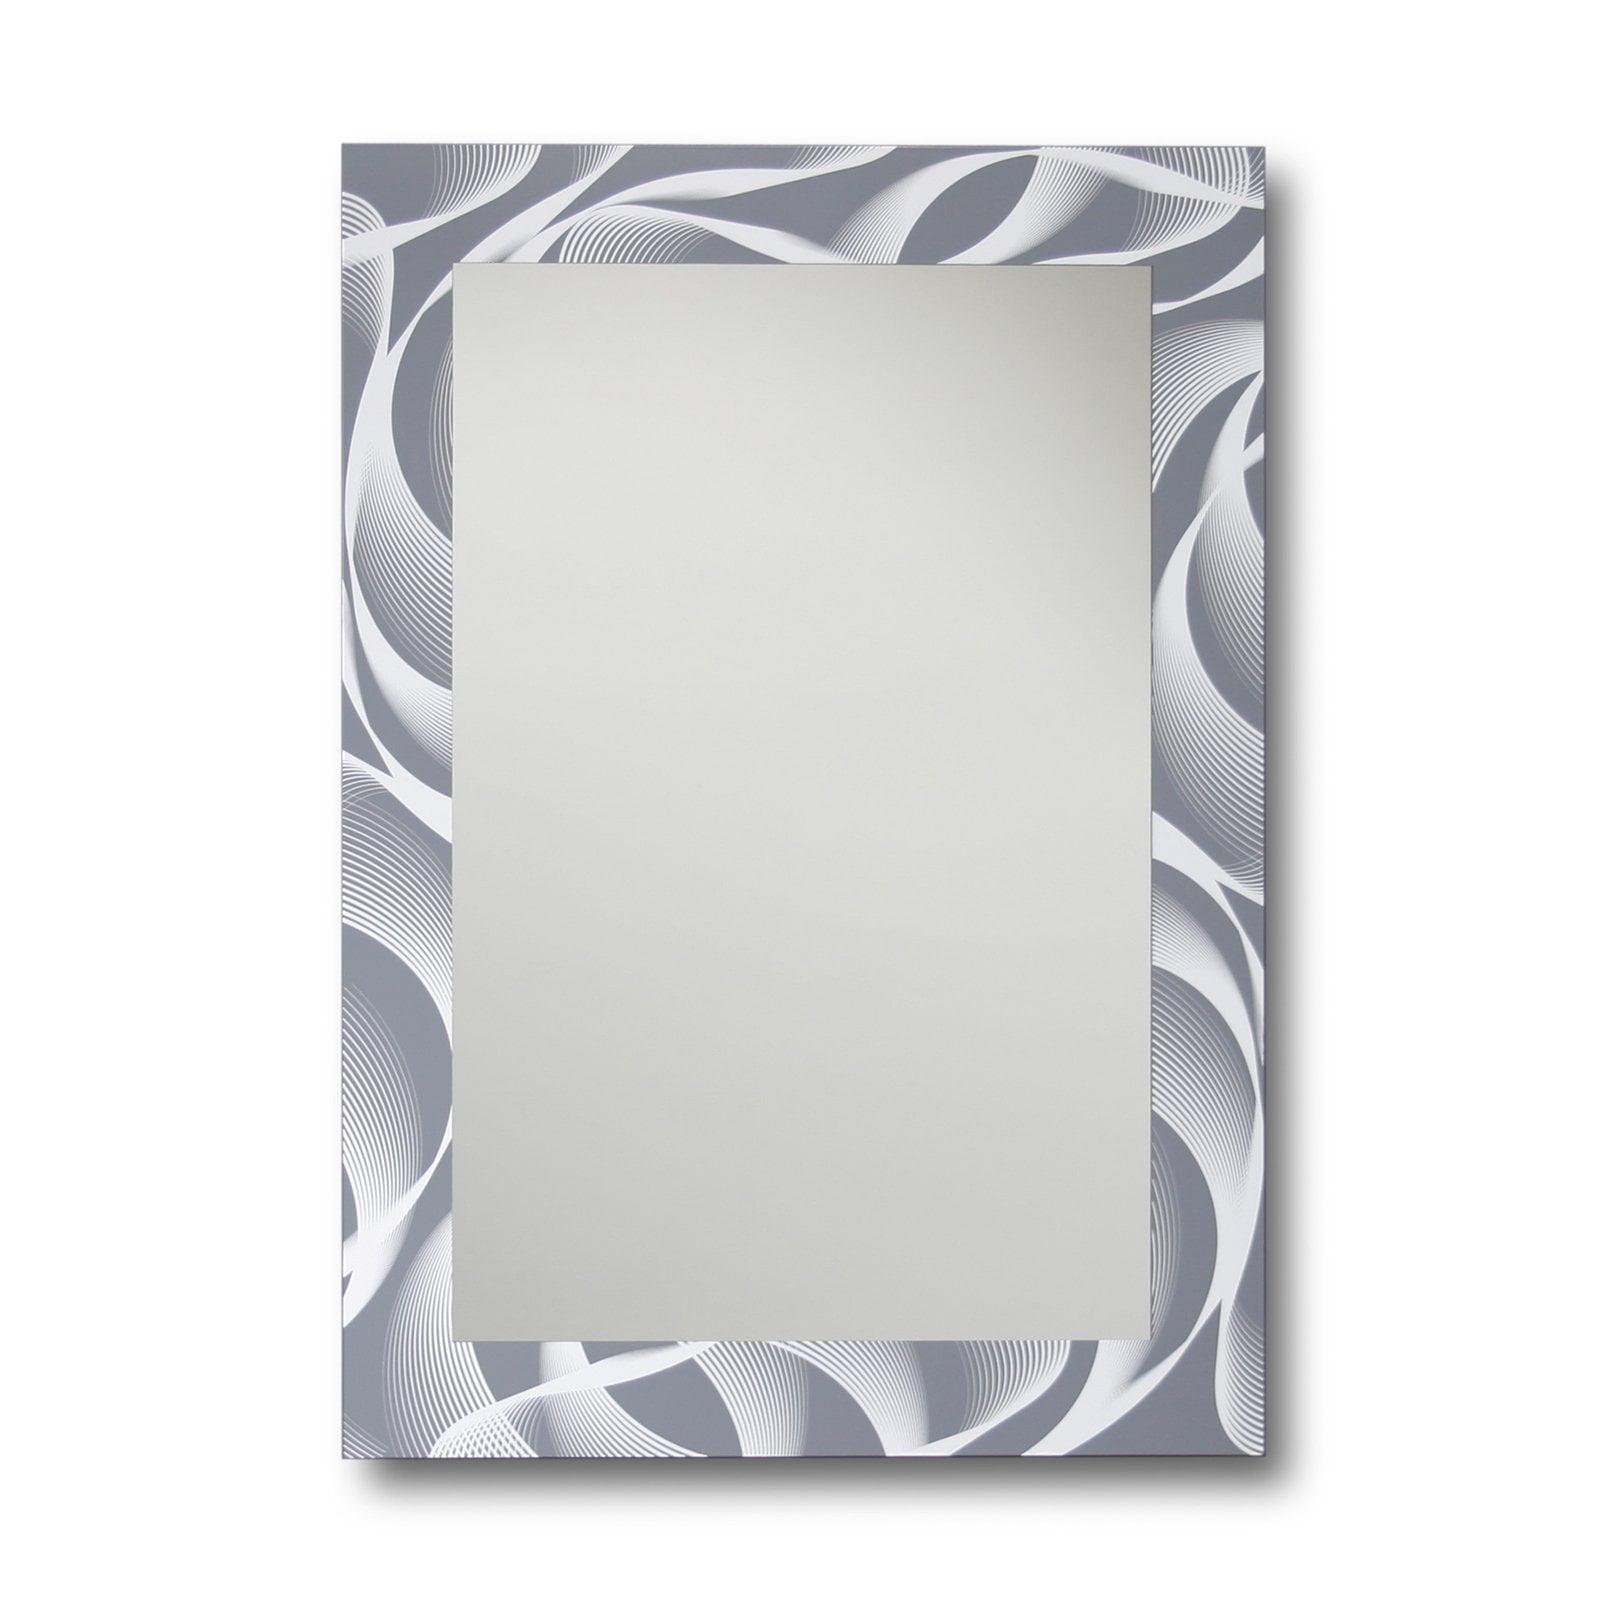 Leick Furniture Gray and White Swirl Decorative Wall Mirror - 18 x 24 in.